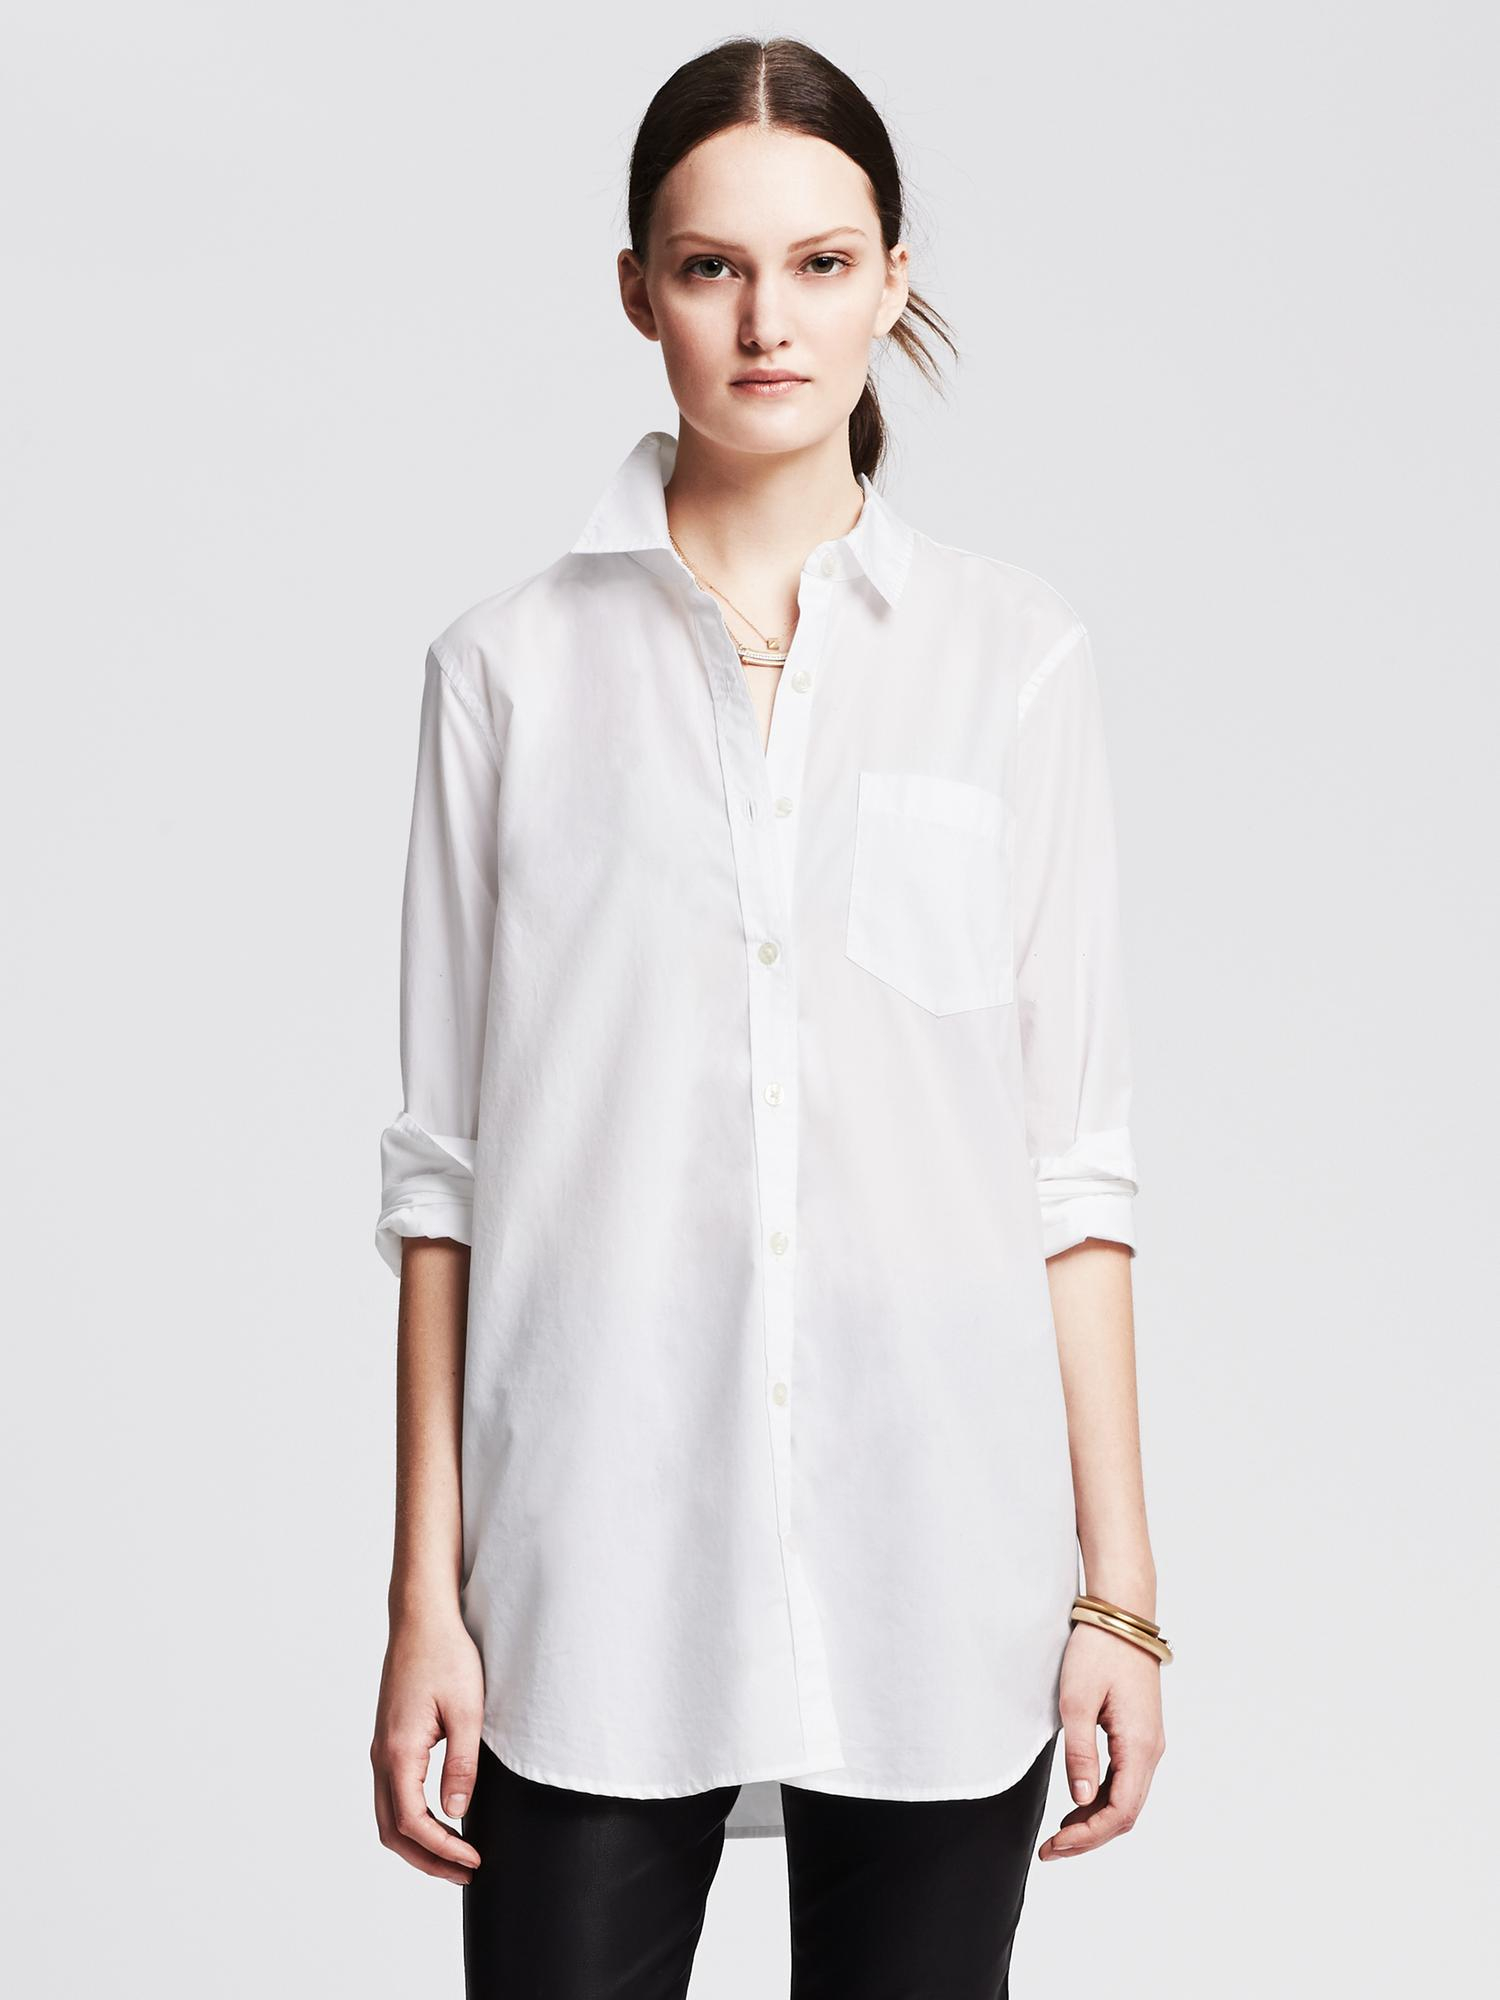 lyst banana republic boyfriend shirt in white. Black Bedroom Furniture Sets. Home Design Ideas